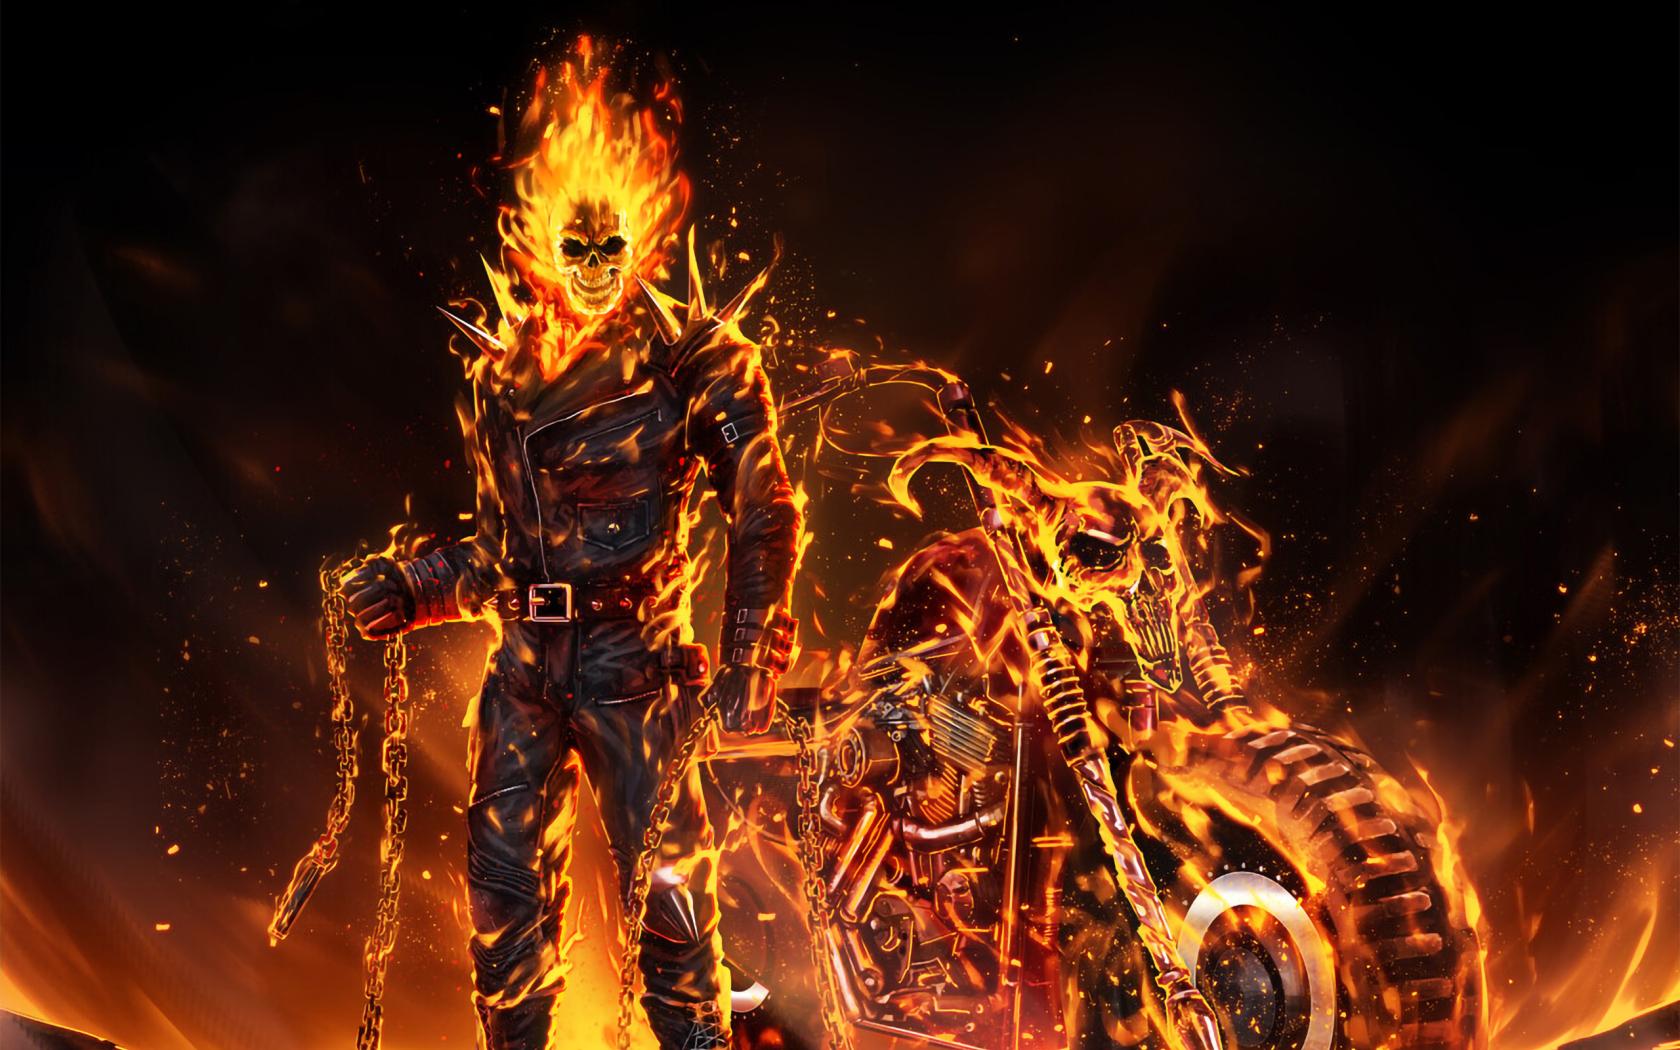 1680x1050 Coolest Ghost Rider 2020 Art 1680x1050 ...